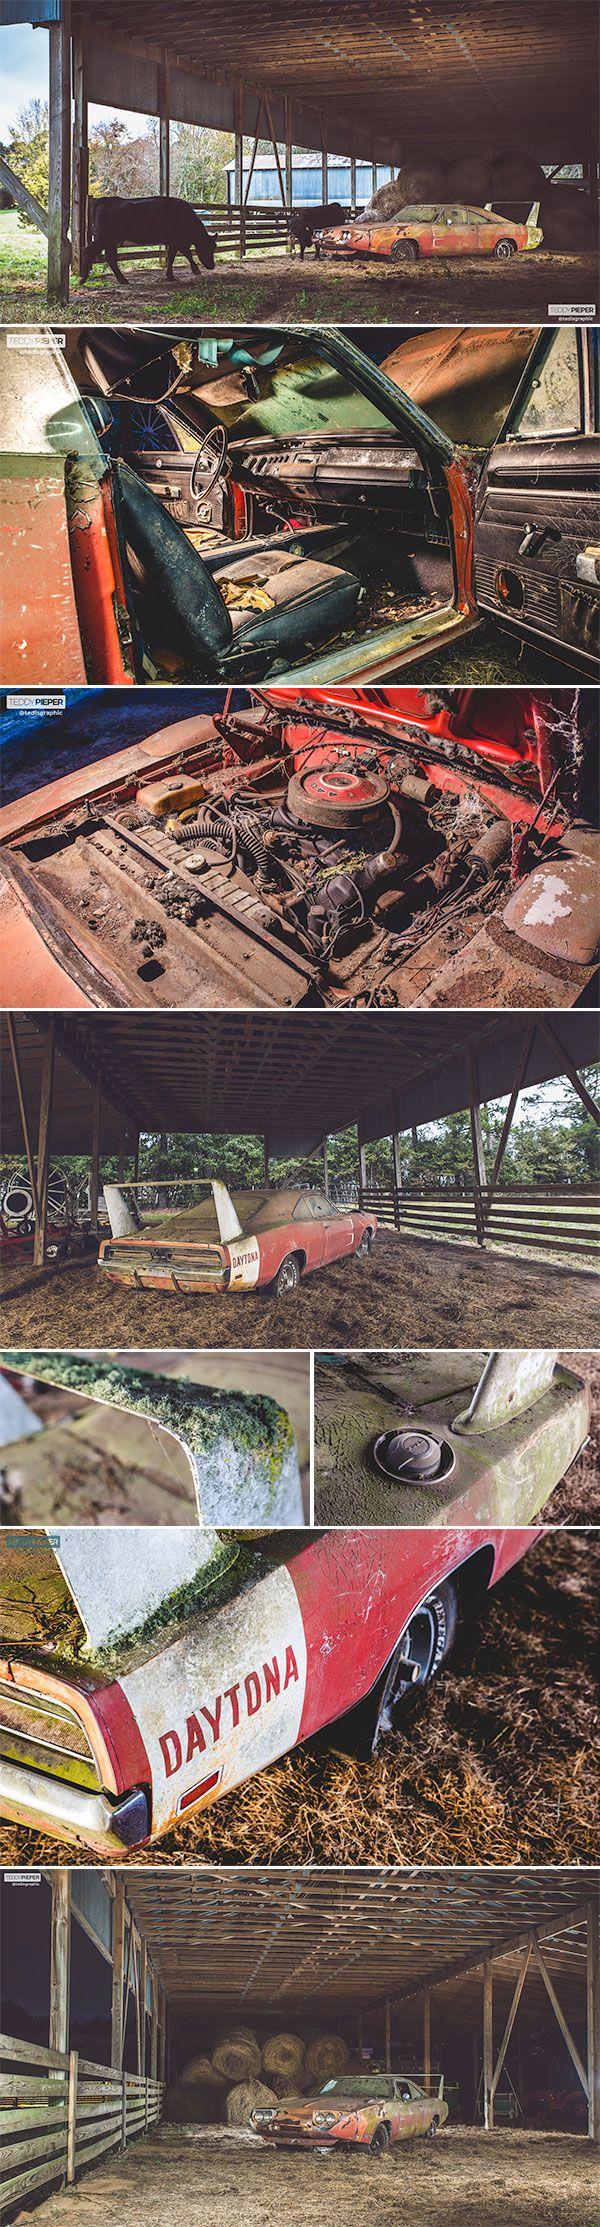 1969 Dodge Daytona Barn Find. This is so sad!